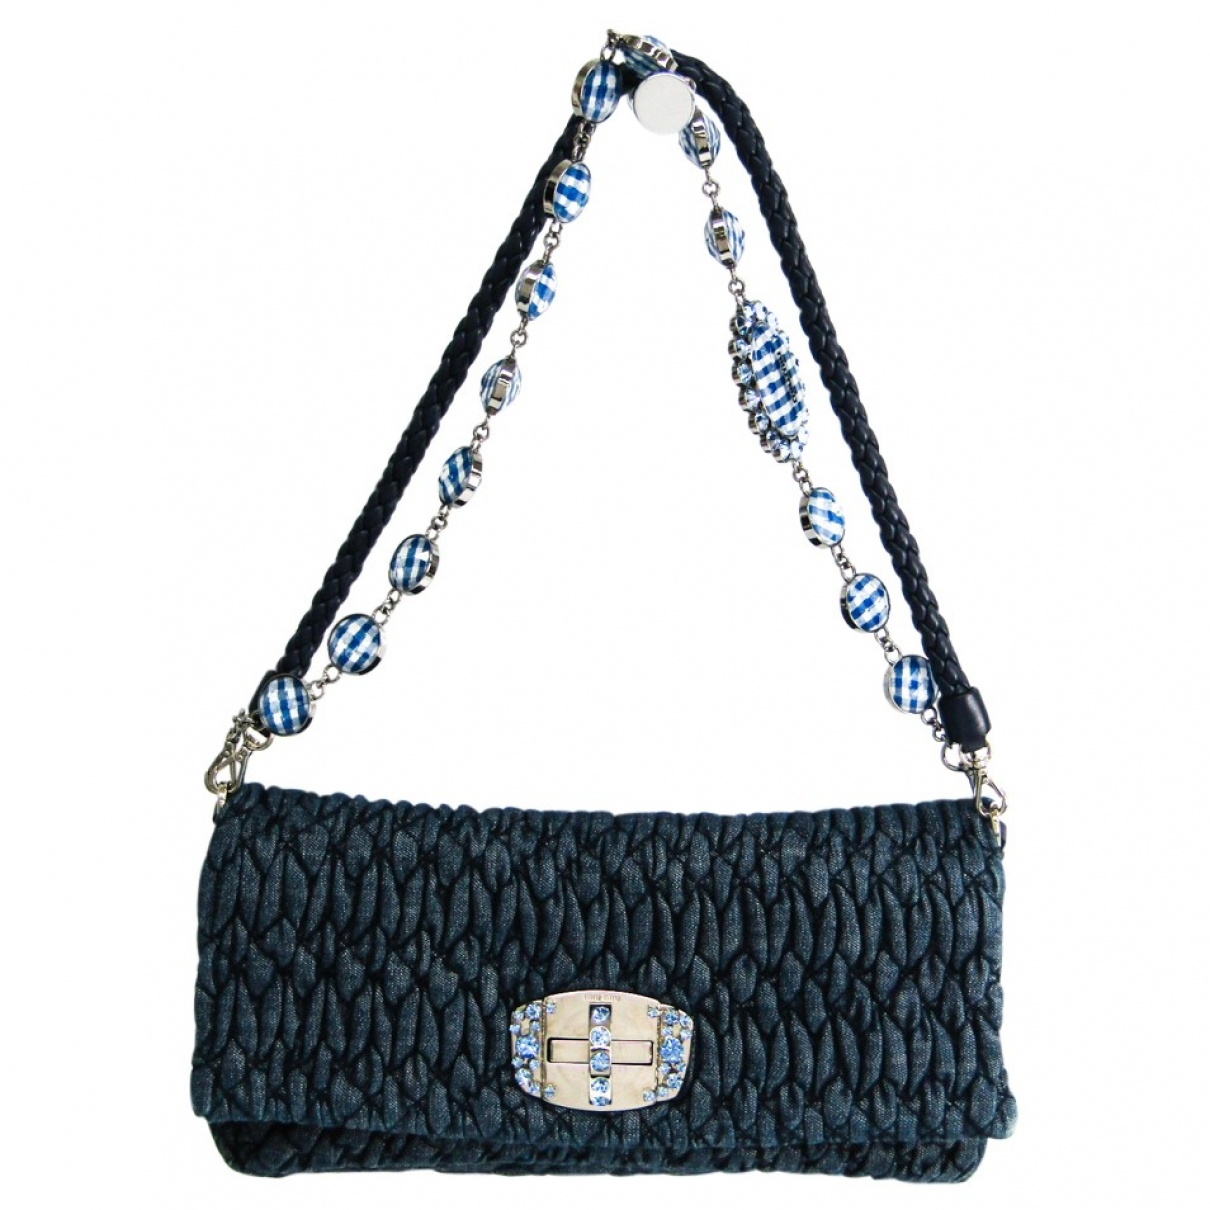 Miu Miu Matelassé Blue Denim - Jeans handbag for Women \N